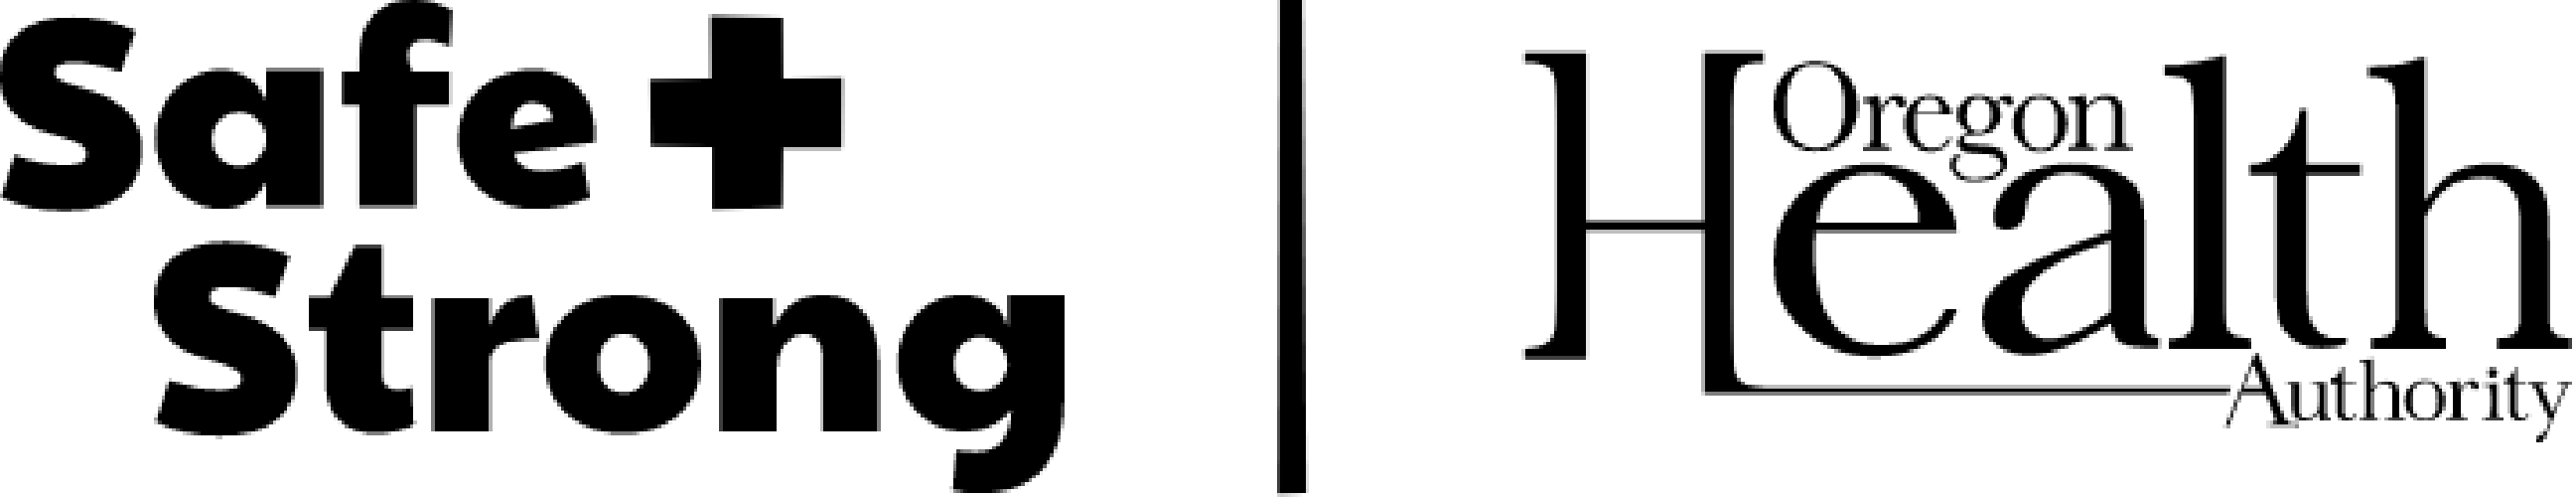 logo-footer@2x_S6OO.png